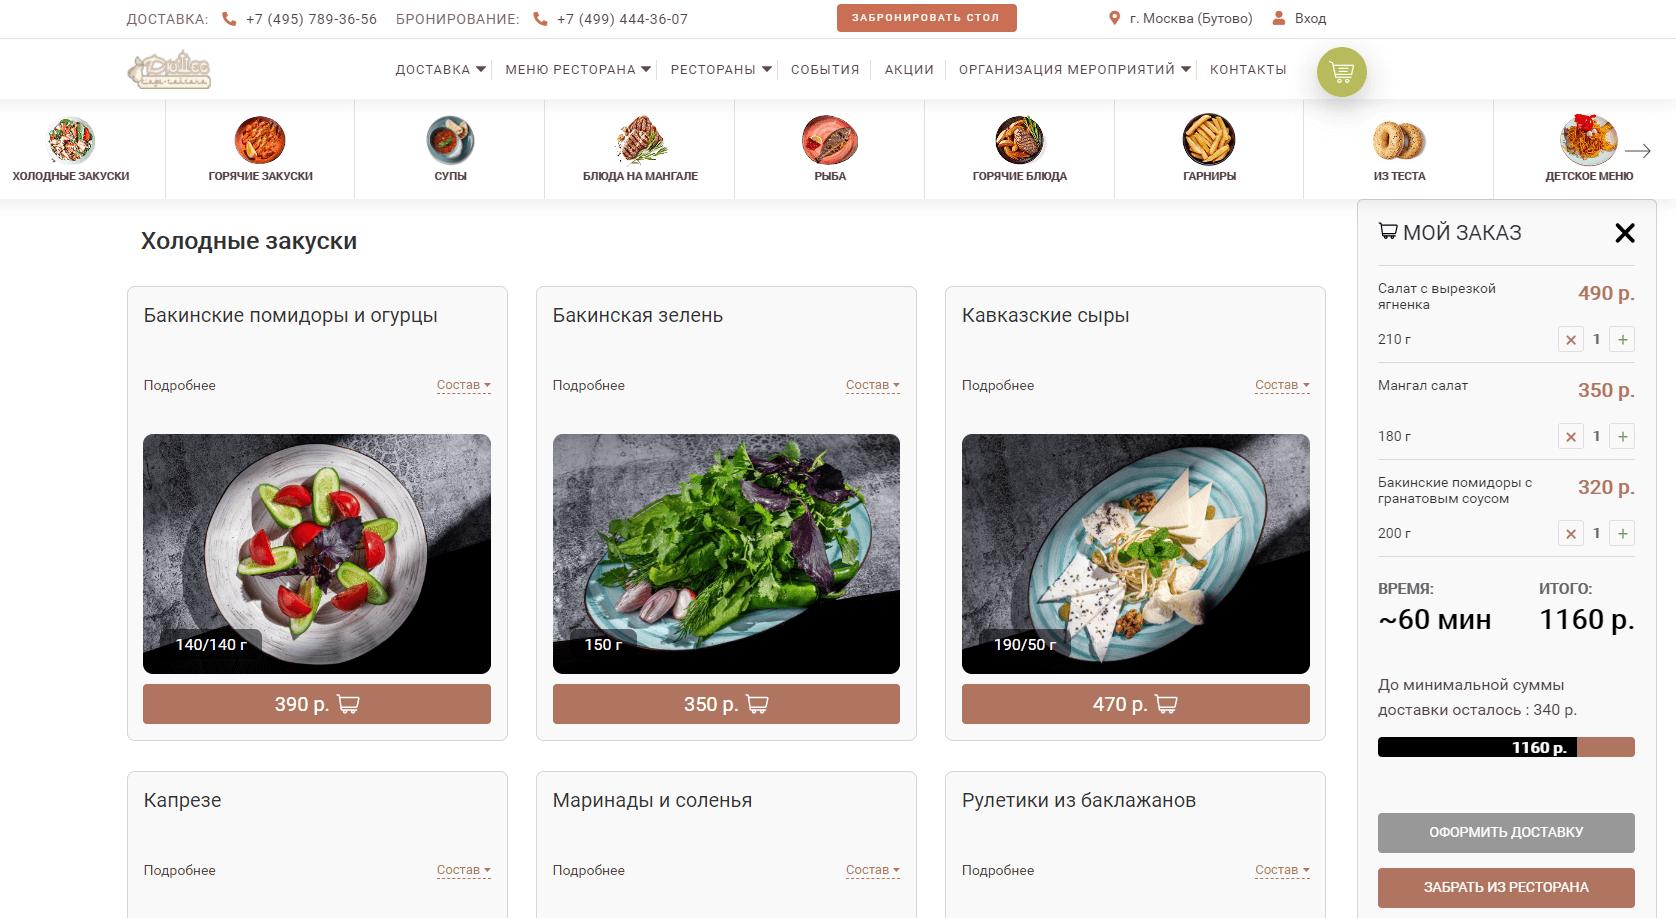 Меню доставки ресторана Дюшес